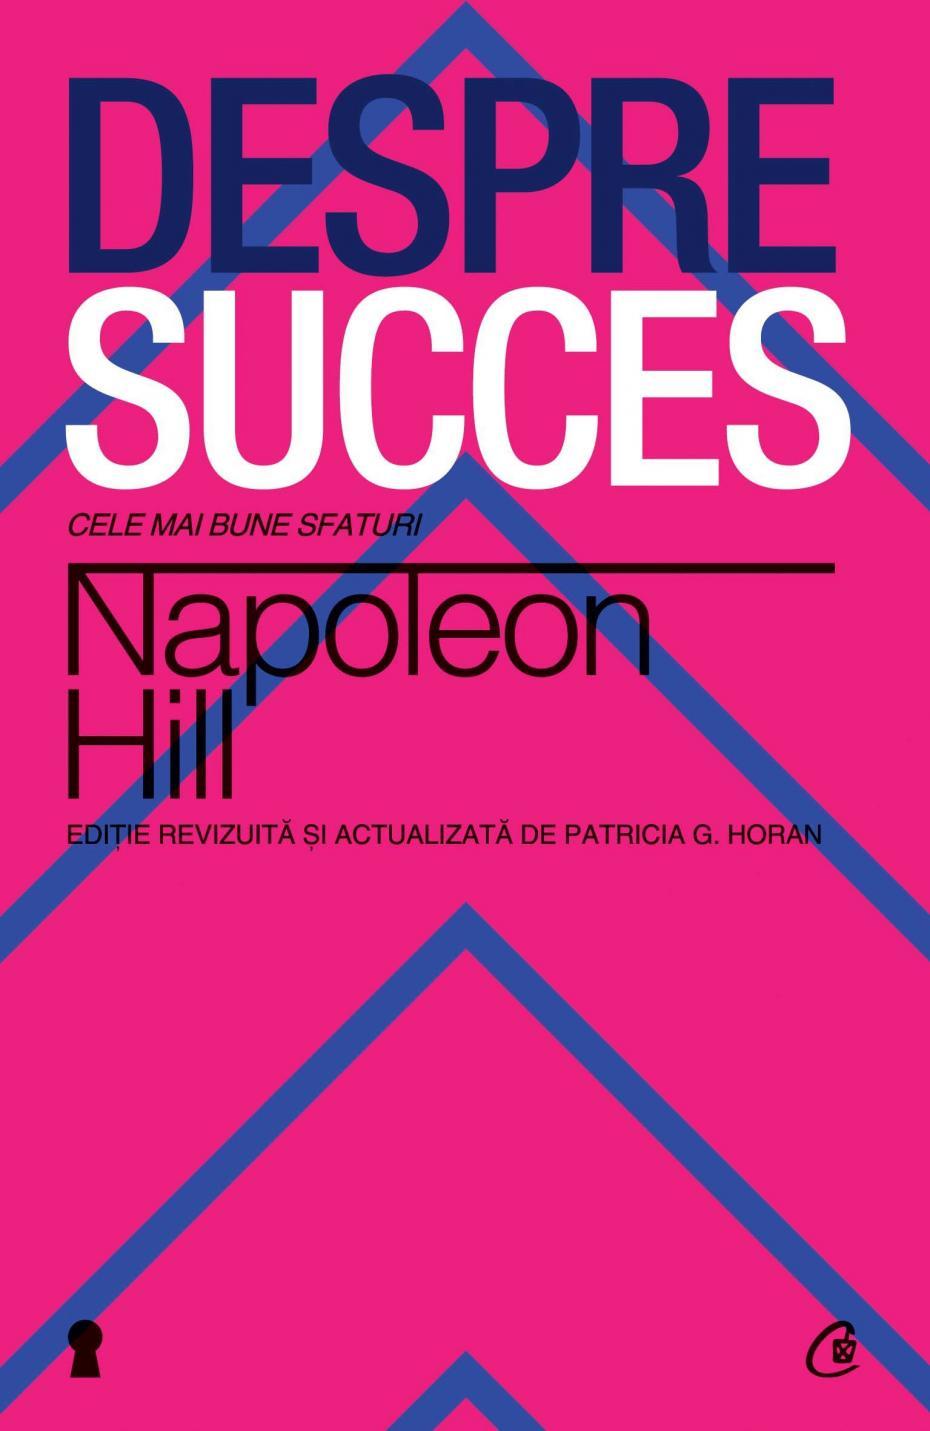 despre-succes_1_fullsize